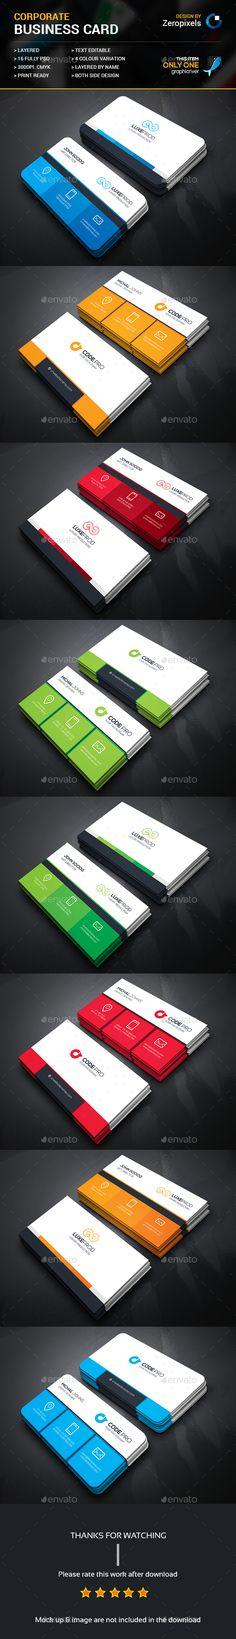 232 Best Business Cards Images On Pinterest Business Card Design